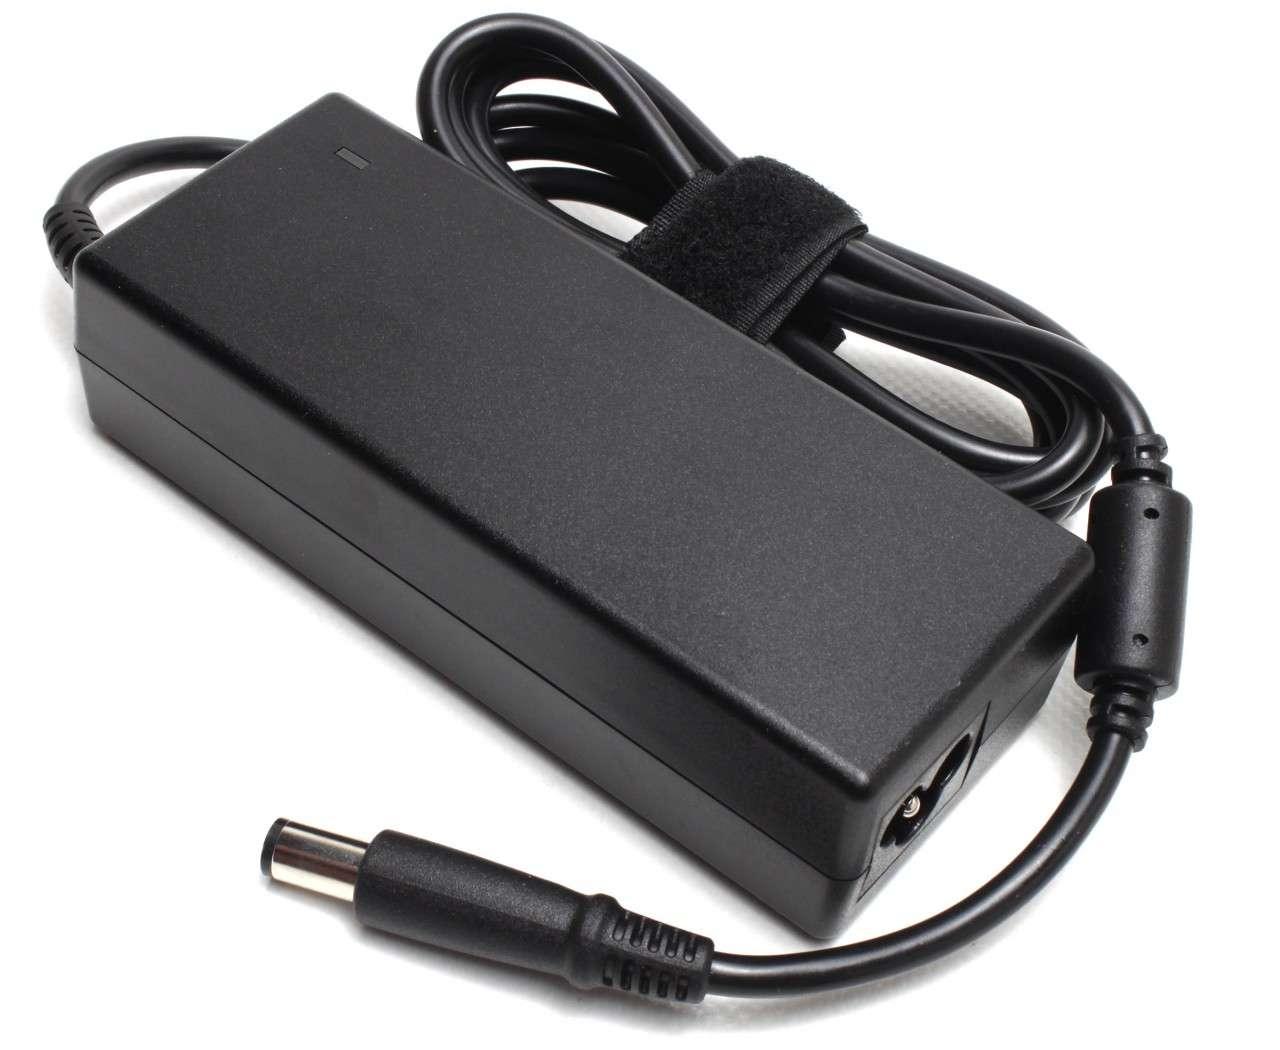 Incarcator Dell Inspiron M5010R VARIANTA 3 imagine powerlaptop.ro 2021